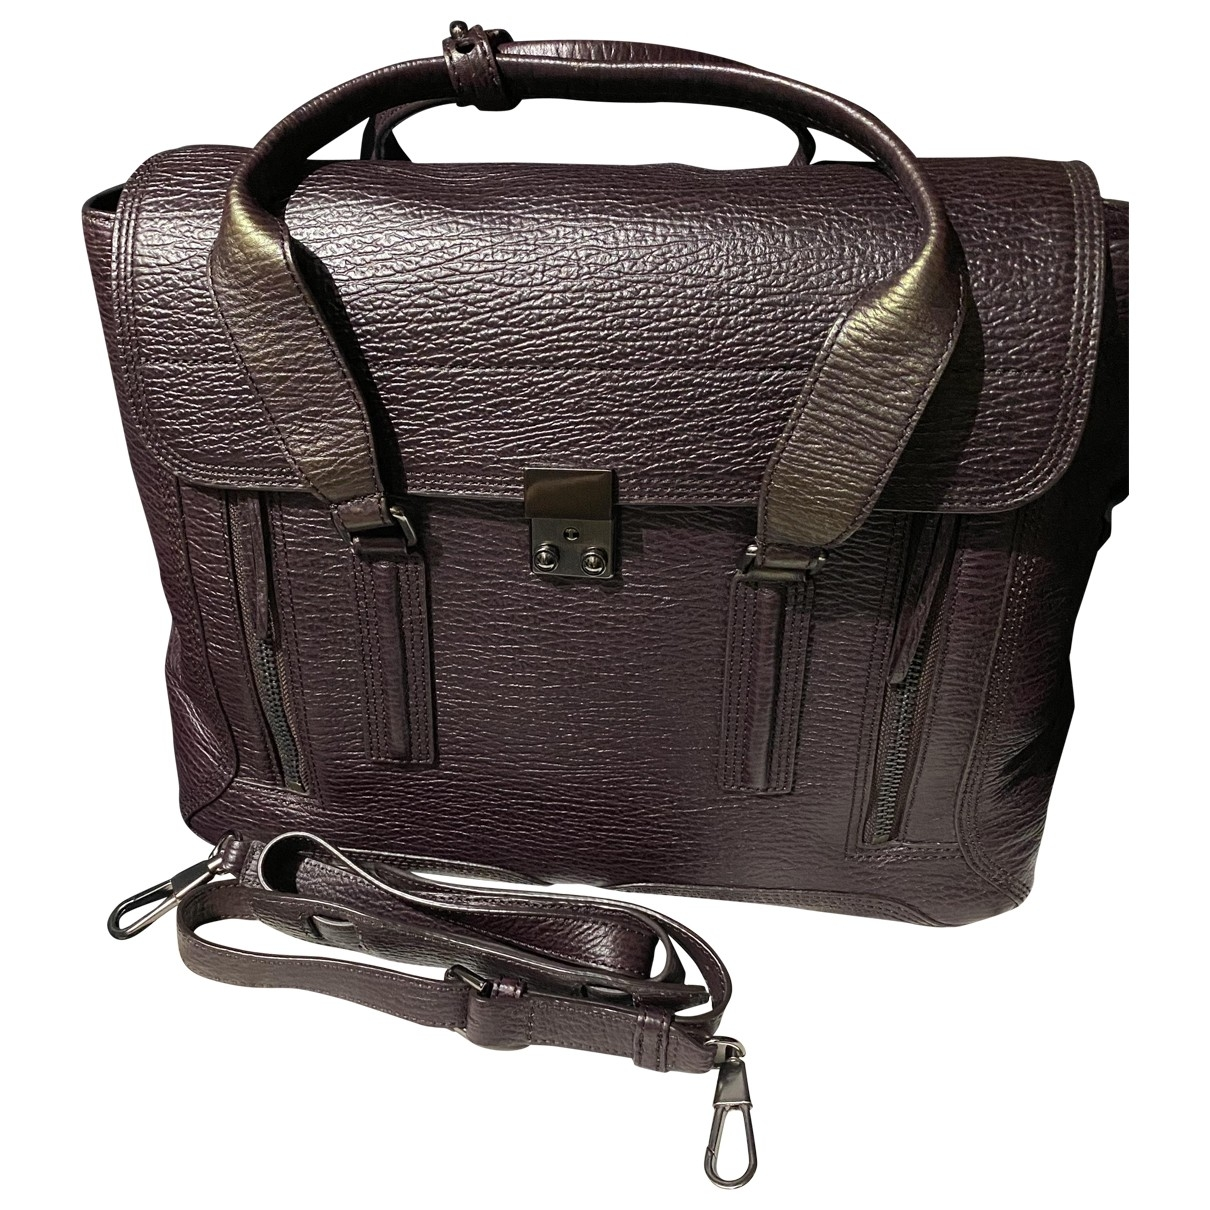 3.1 Phillip Lim Pashli Purple Leather handbag for Women \N